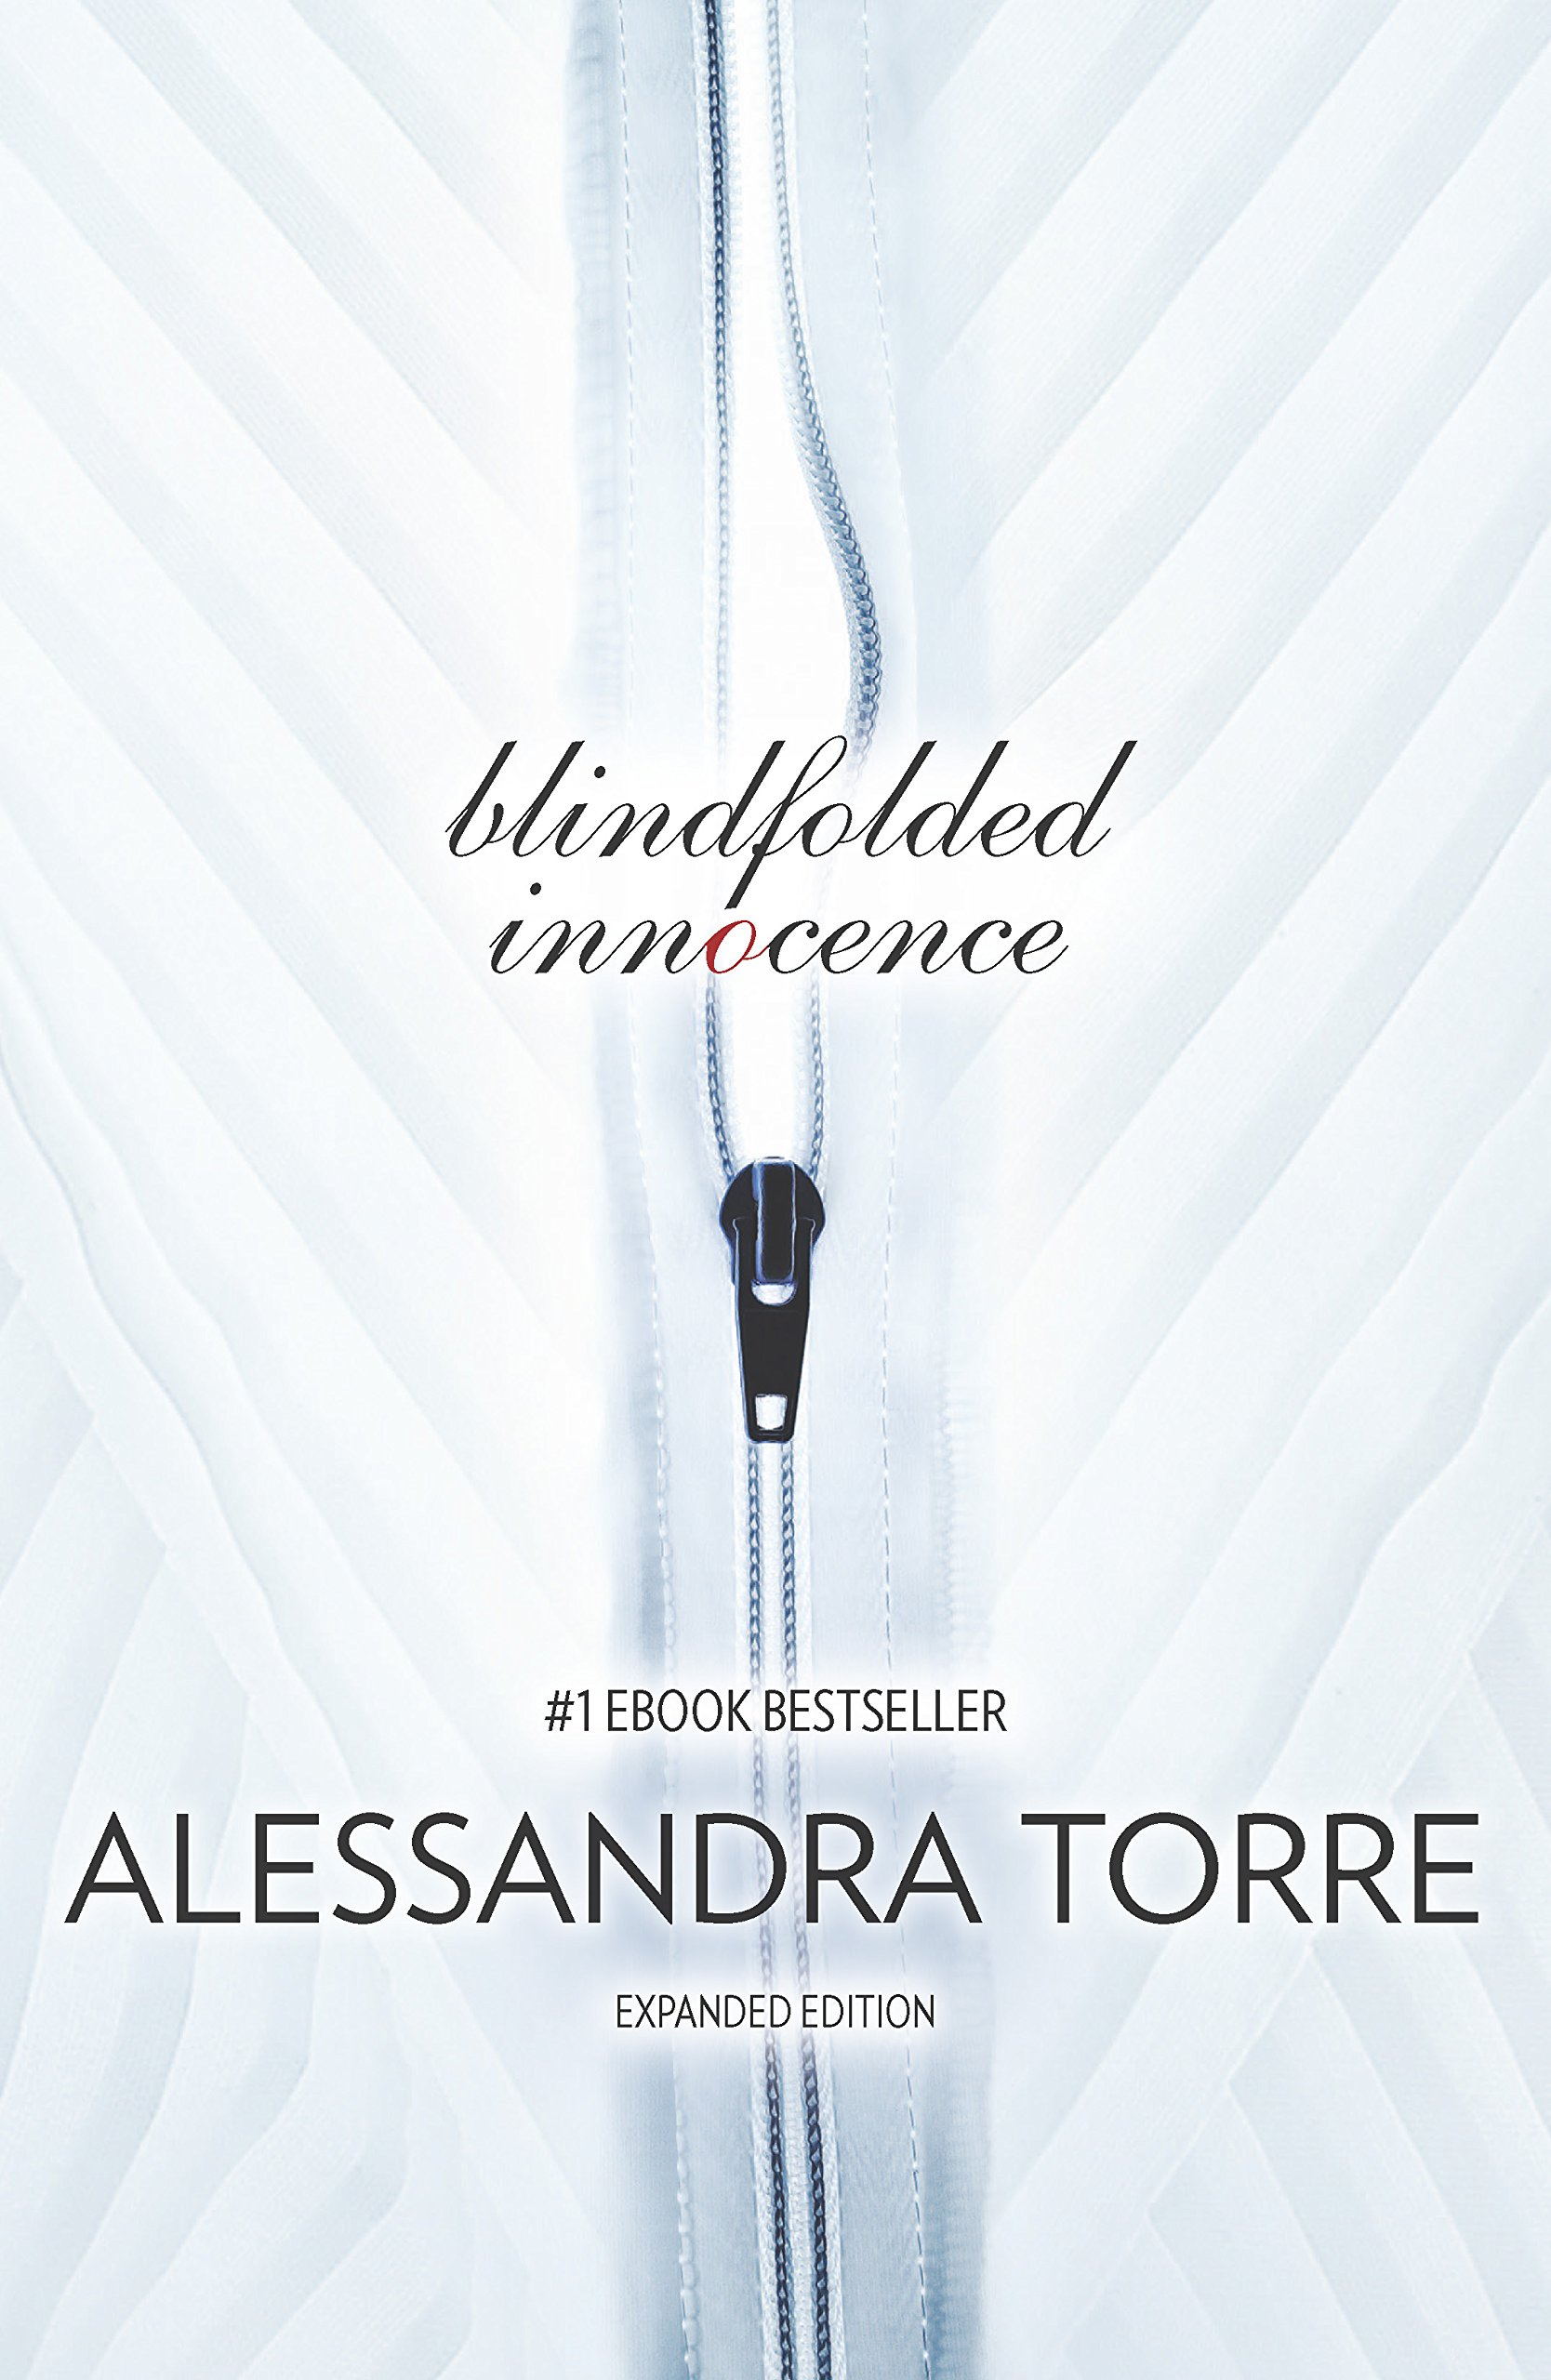 Amazon.com: Blindfolded Innocence (Hqn) (9780373778287): Alessandra Torre:  Books